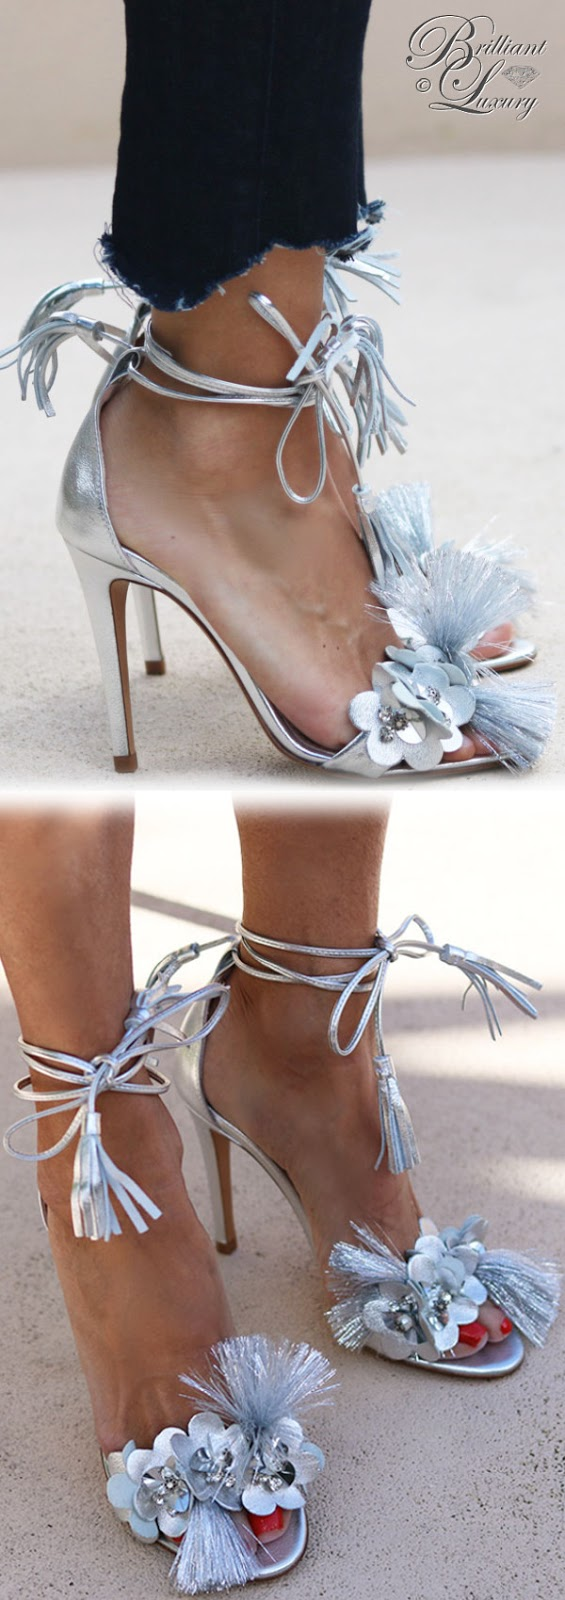 Brilliant Luxury ♦ Alameda Turquesa Lilac sandals silver